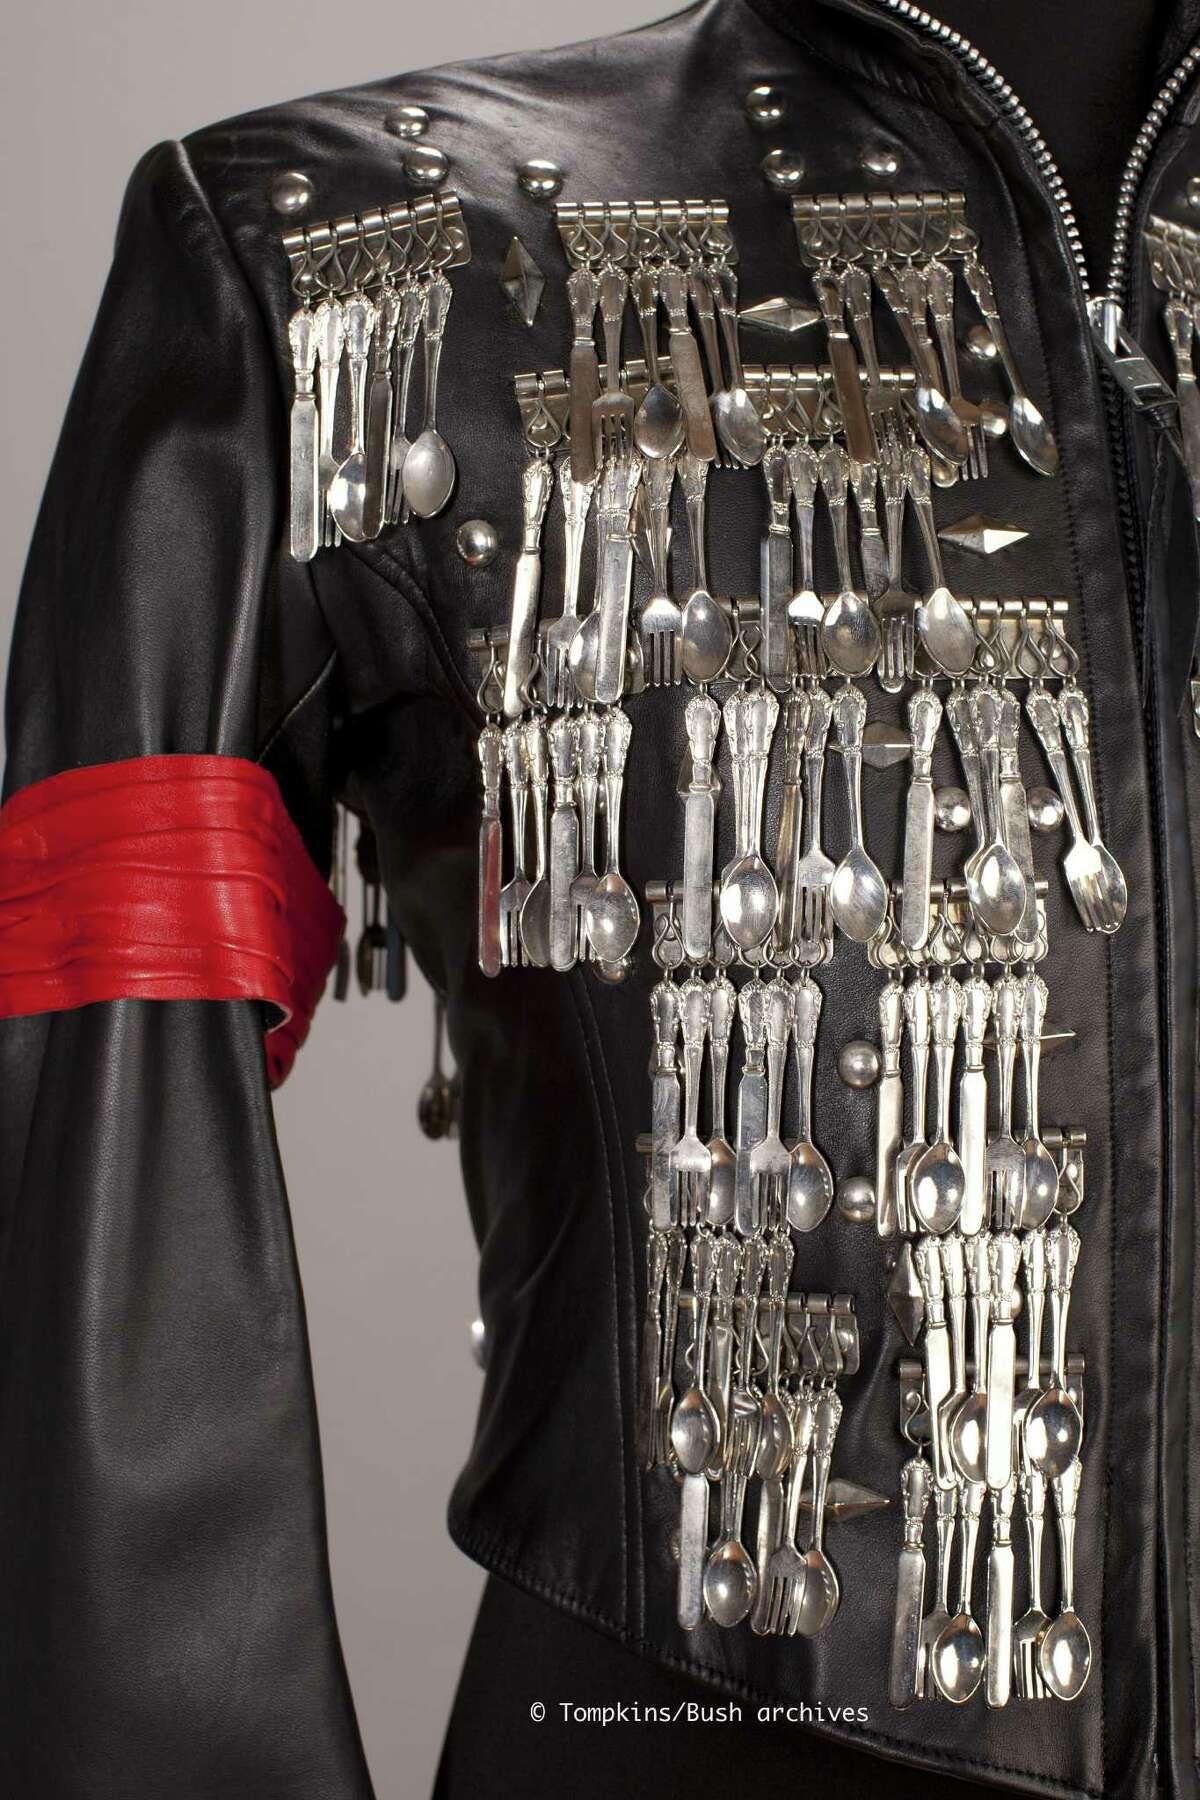 Michael Bush said Michael Jackson often wore this